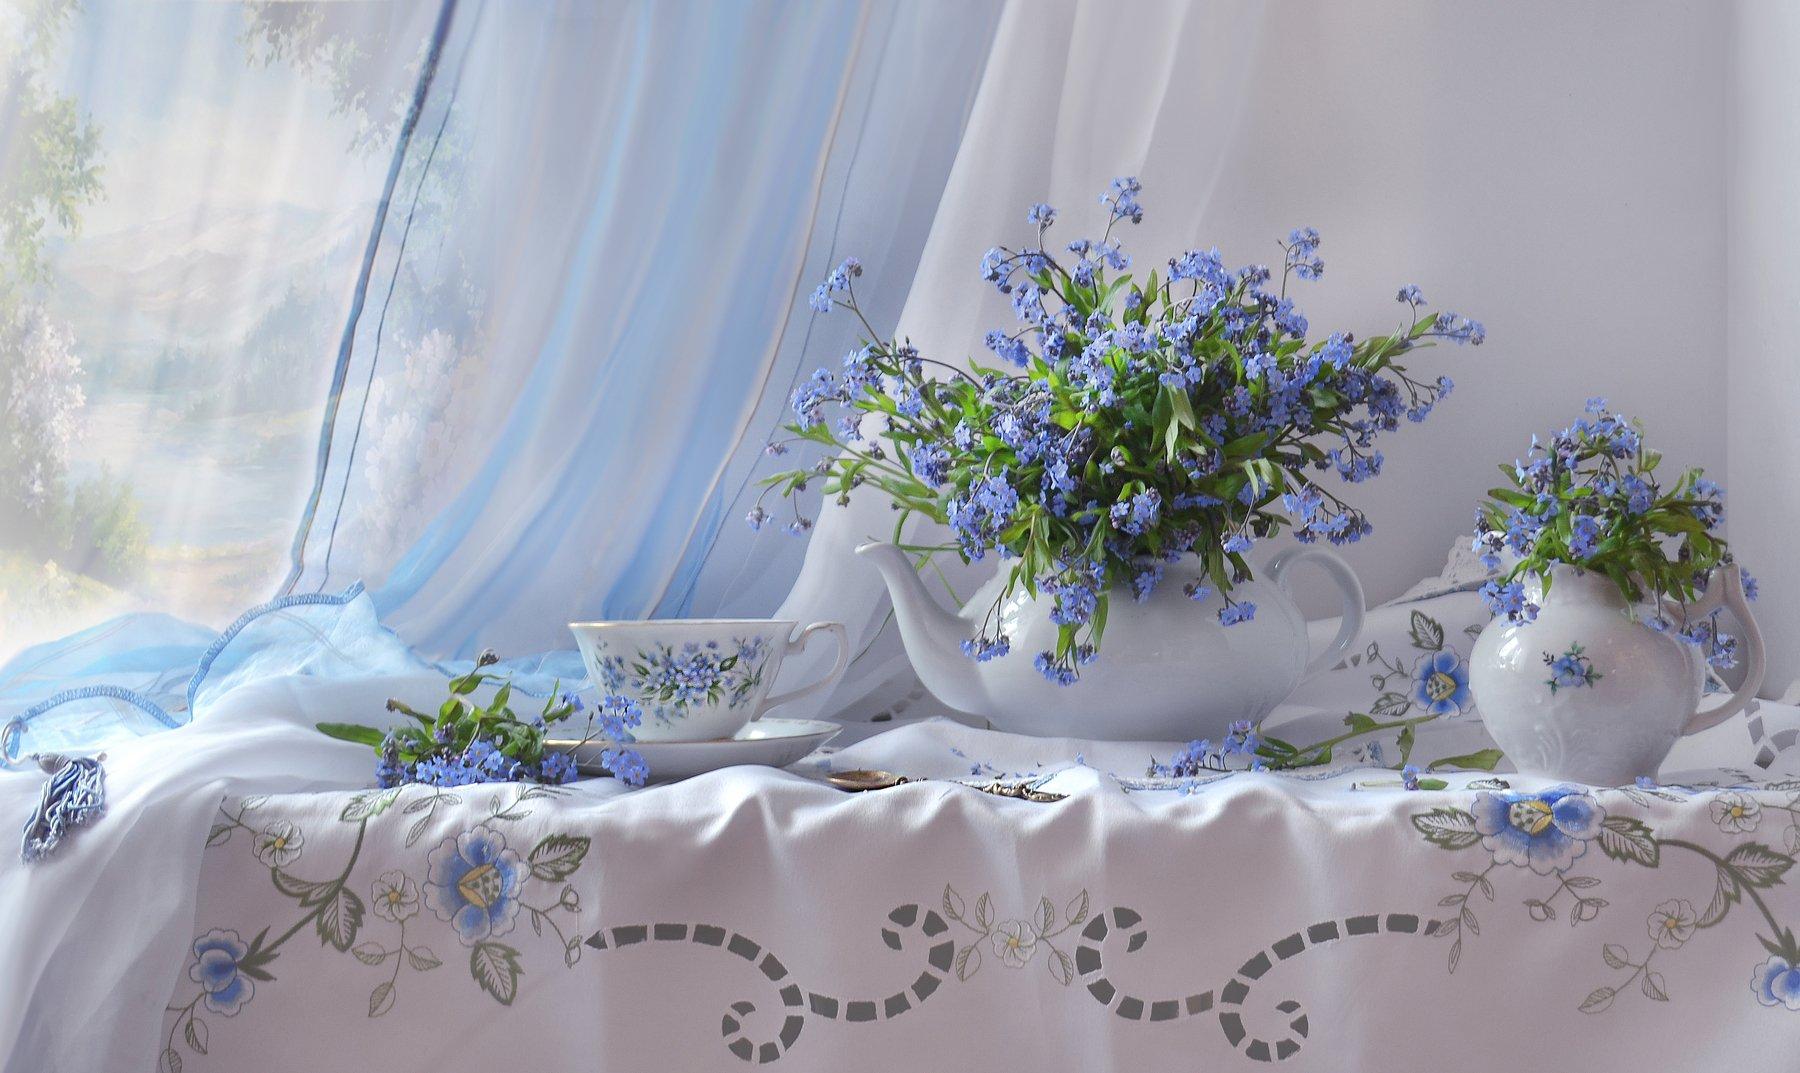 still life, натюрморт, чай, чайник, кувшинчик, весна на пороге, цветы, фото натюрморт, фарфор, февраль, незабудки, зима,, Колова Валентина